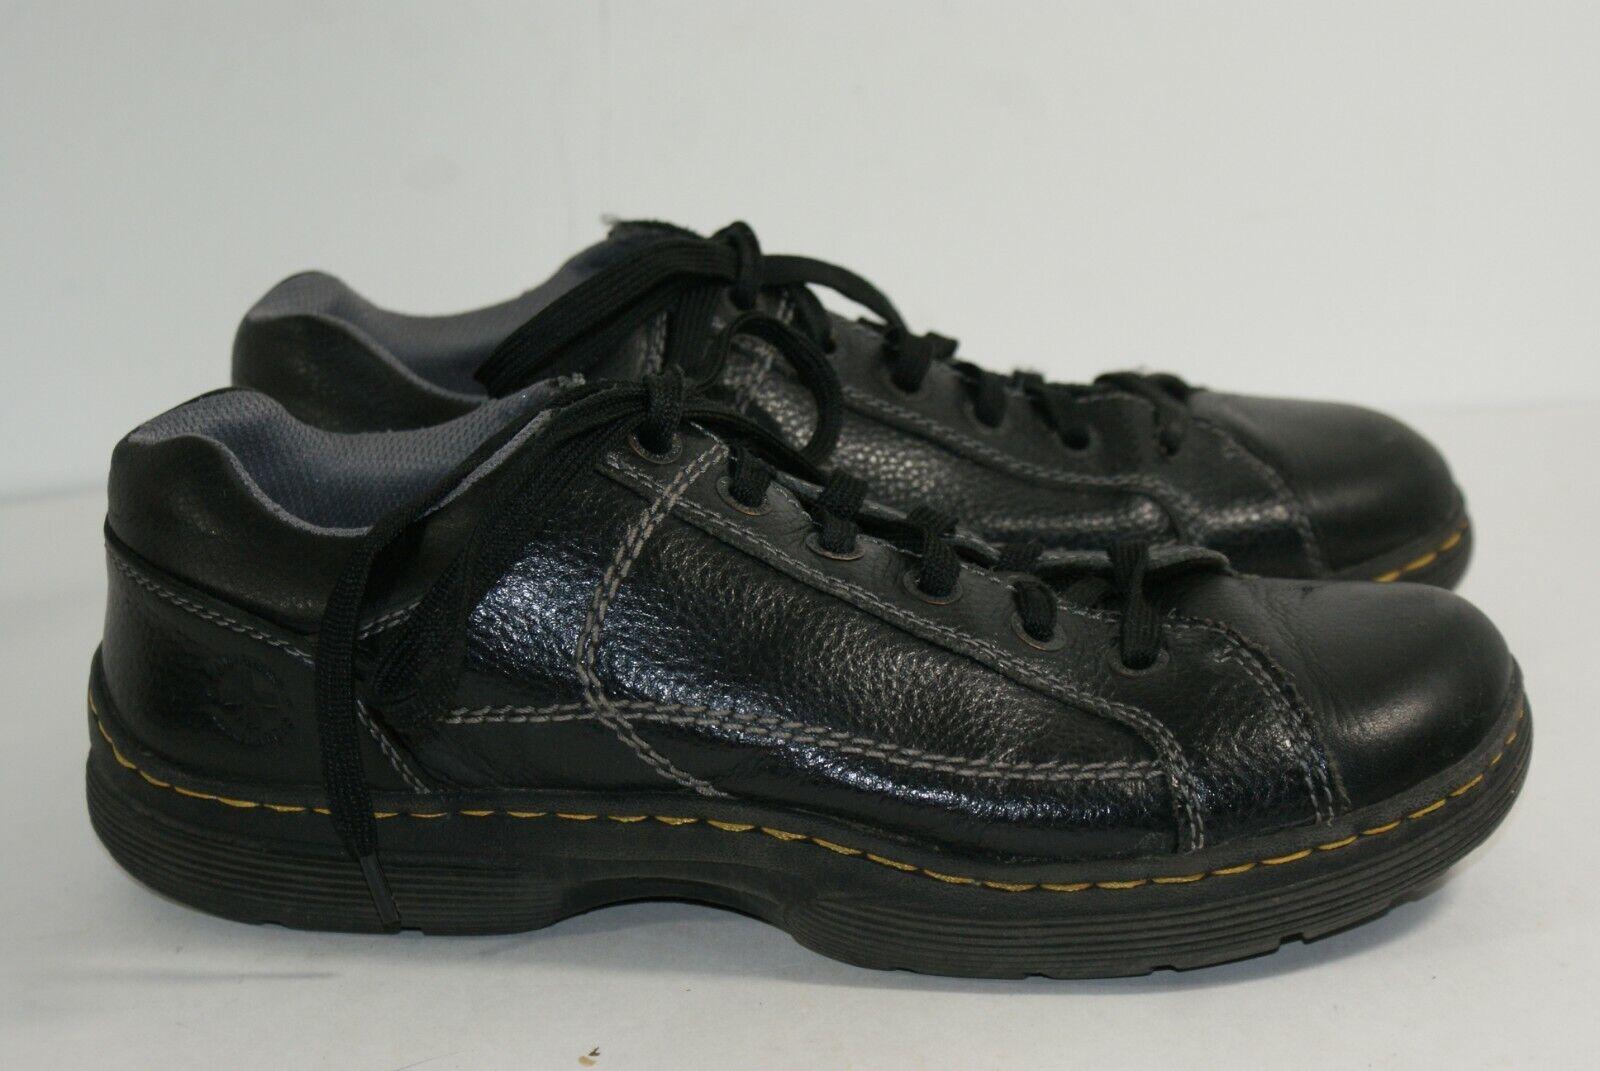 New Men Black Cream Suede Real Leather Loafers Vintage Horsebit Buckle MOD Shoes